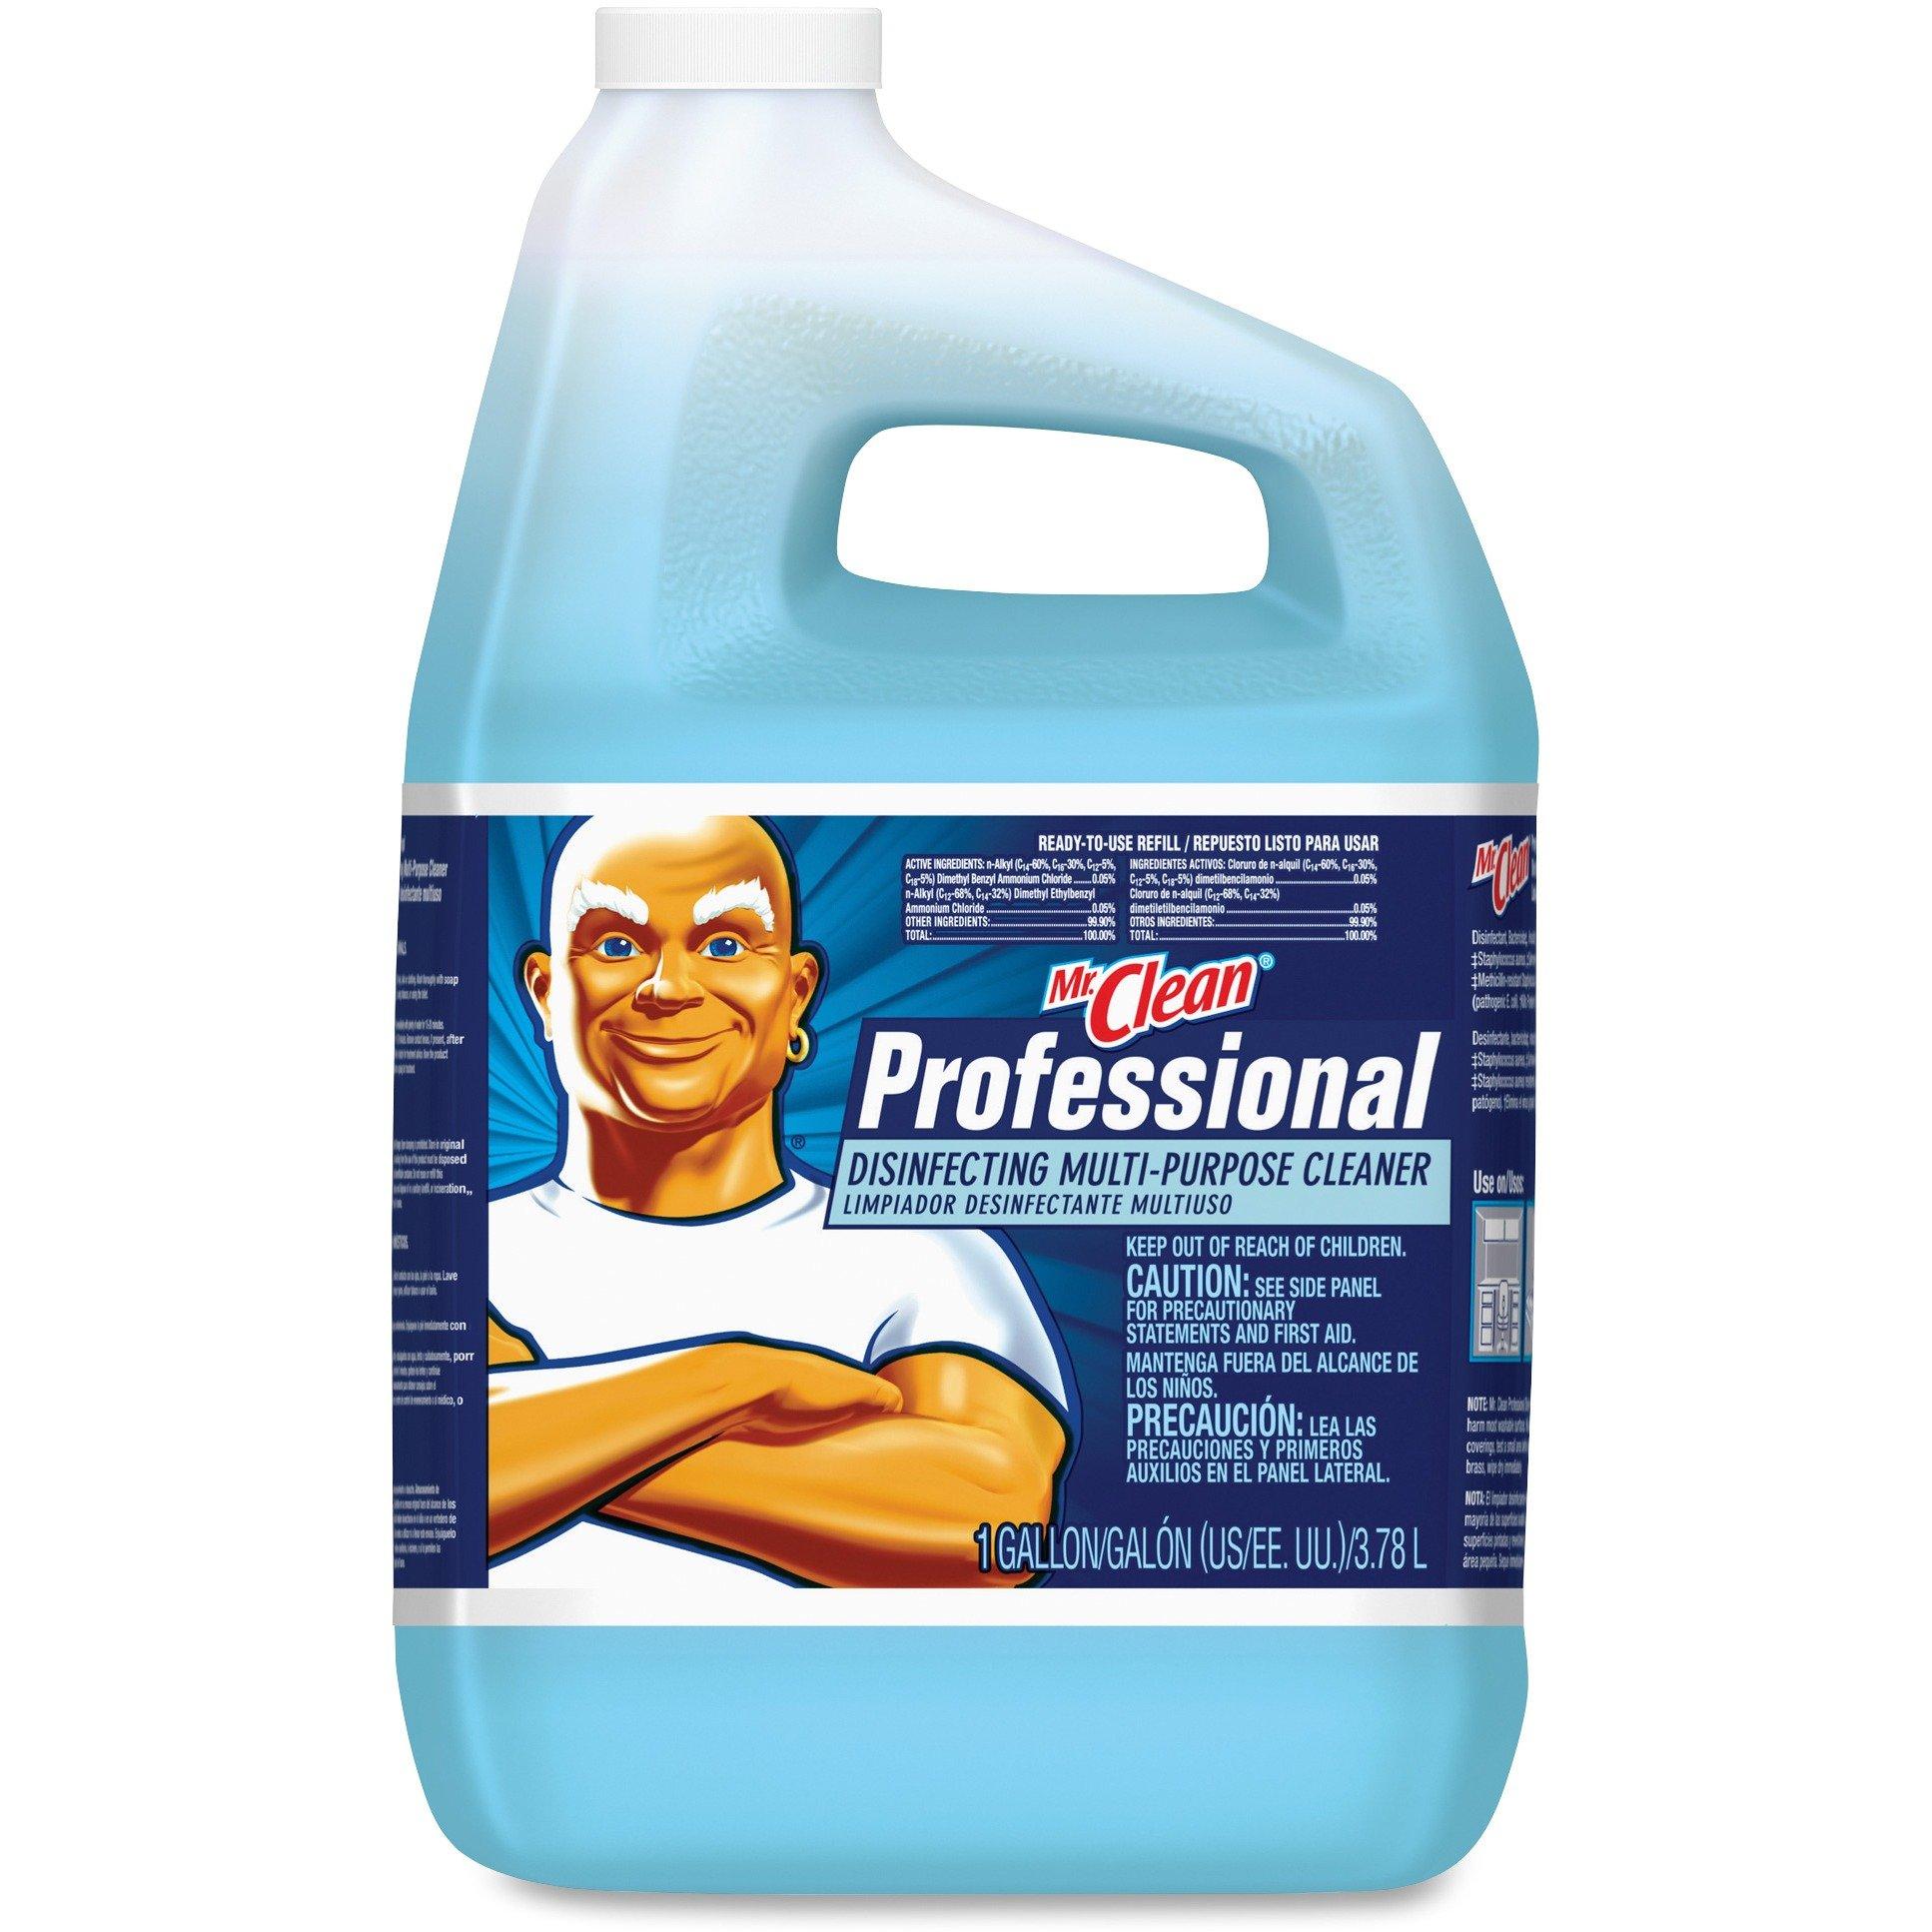 Mr Clean Professional Disinfecting Multi-Purpose Cleaner, 1 Gallon (Case of 4)